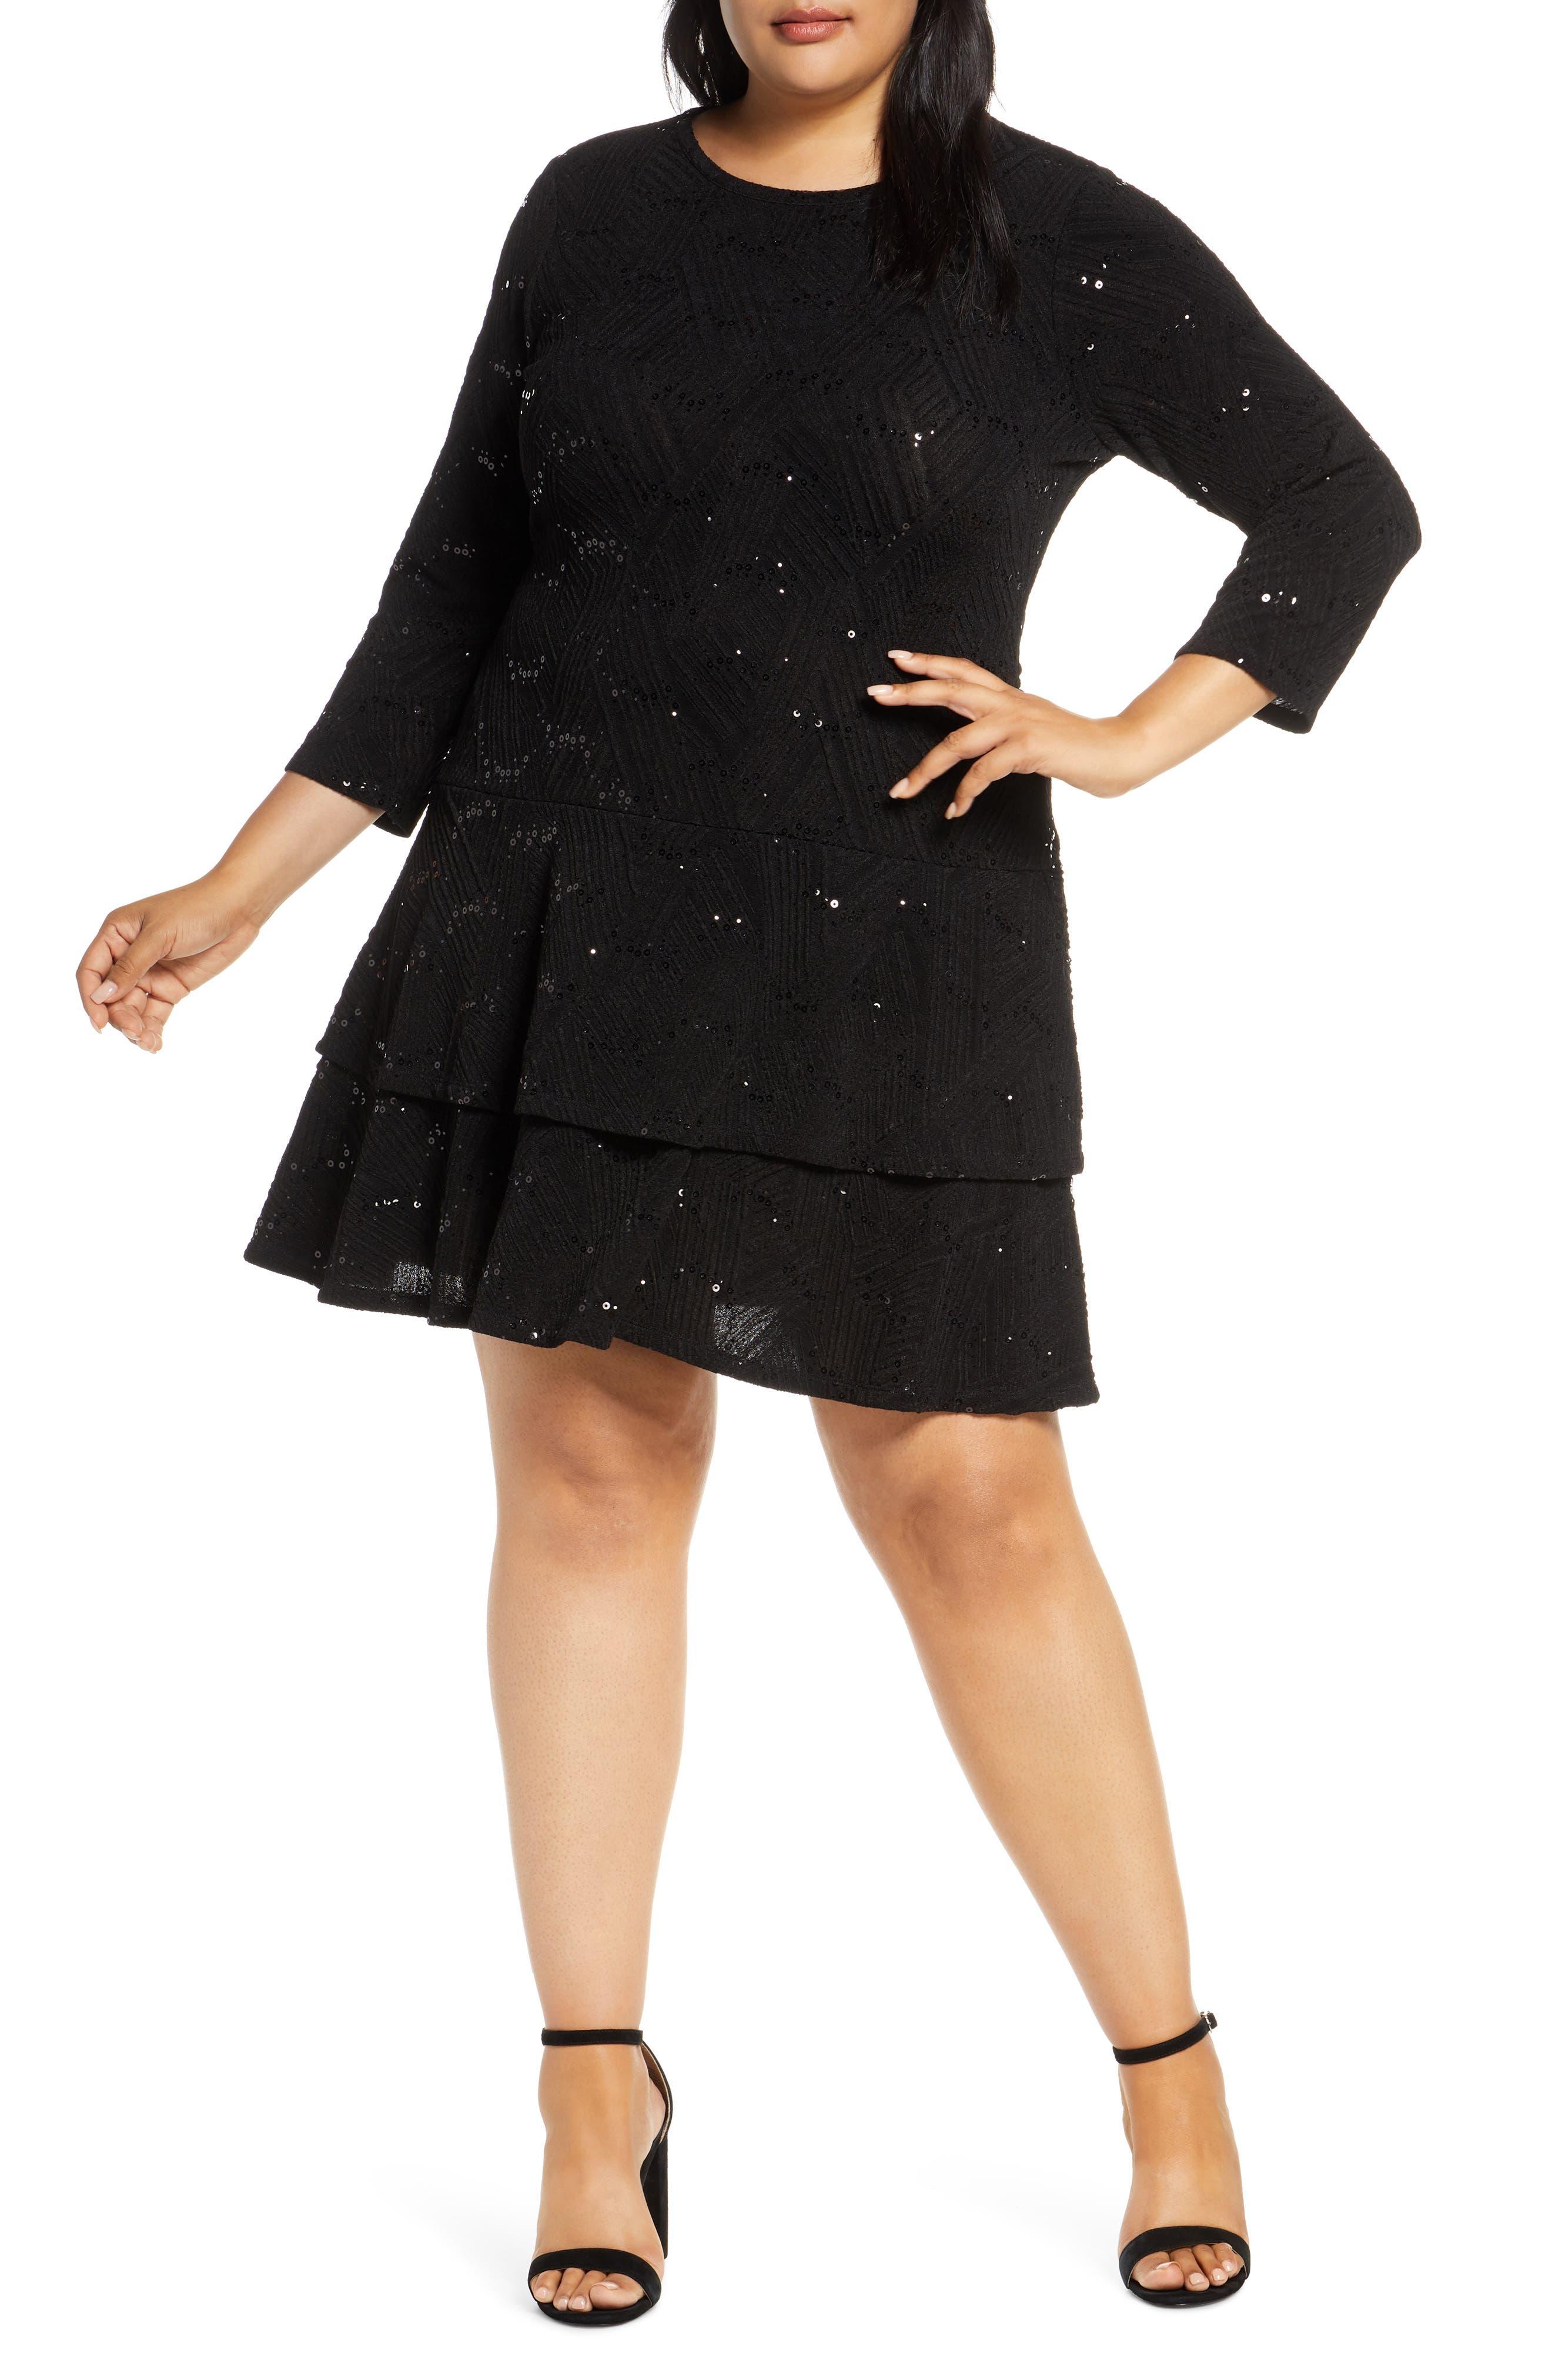 Vintage 1920s Dresses – Where to Buy Plus Size Womens Michael Michael Kors Sequin Jacquard Tiered Dress $140.00 AT vintagedancer.com